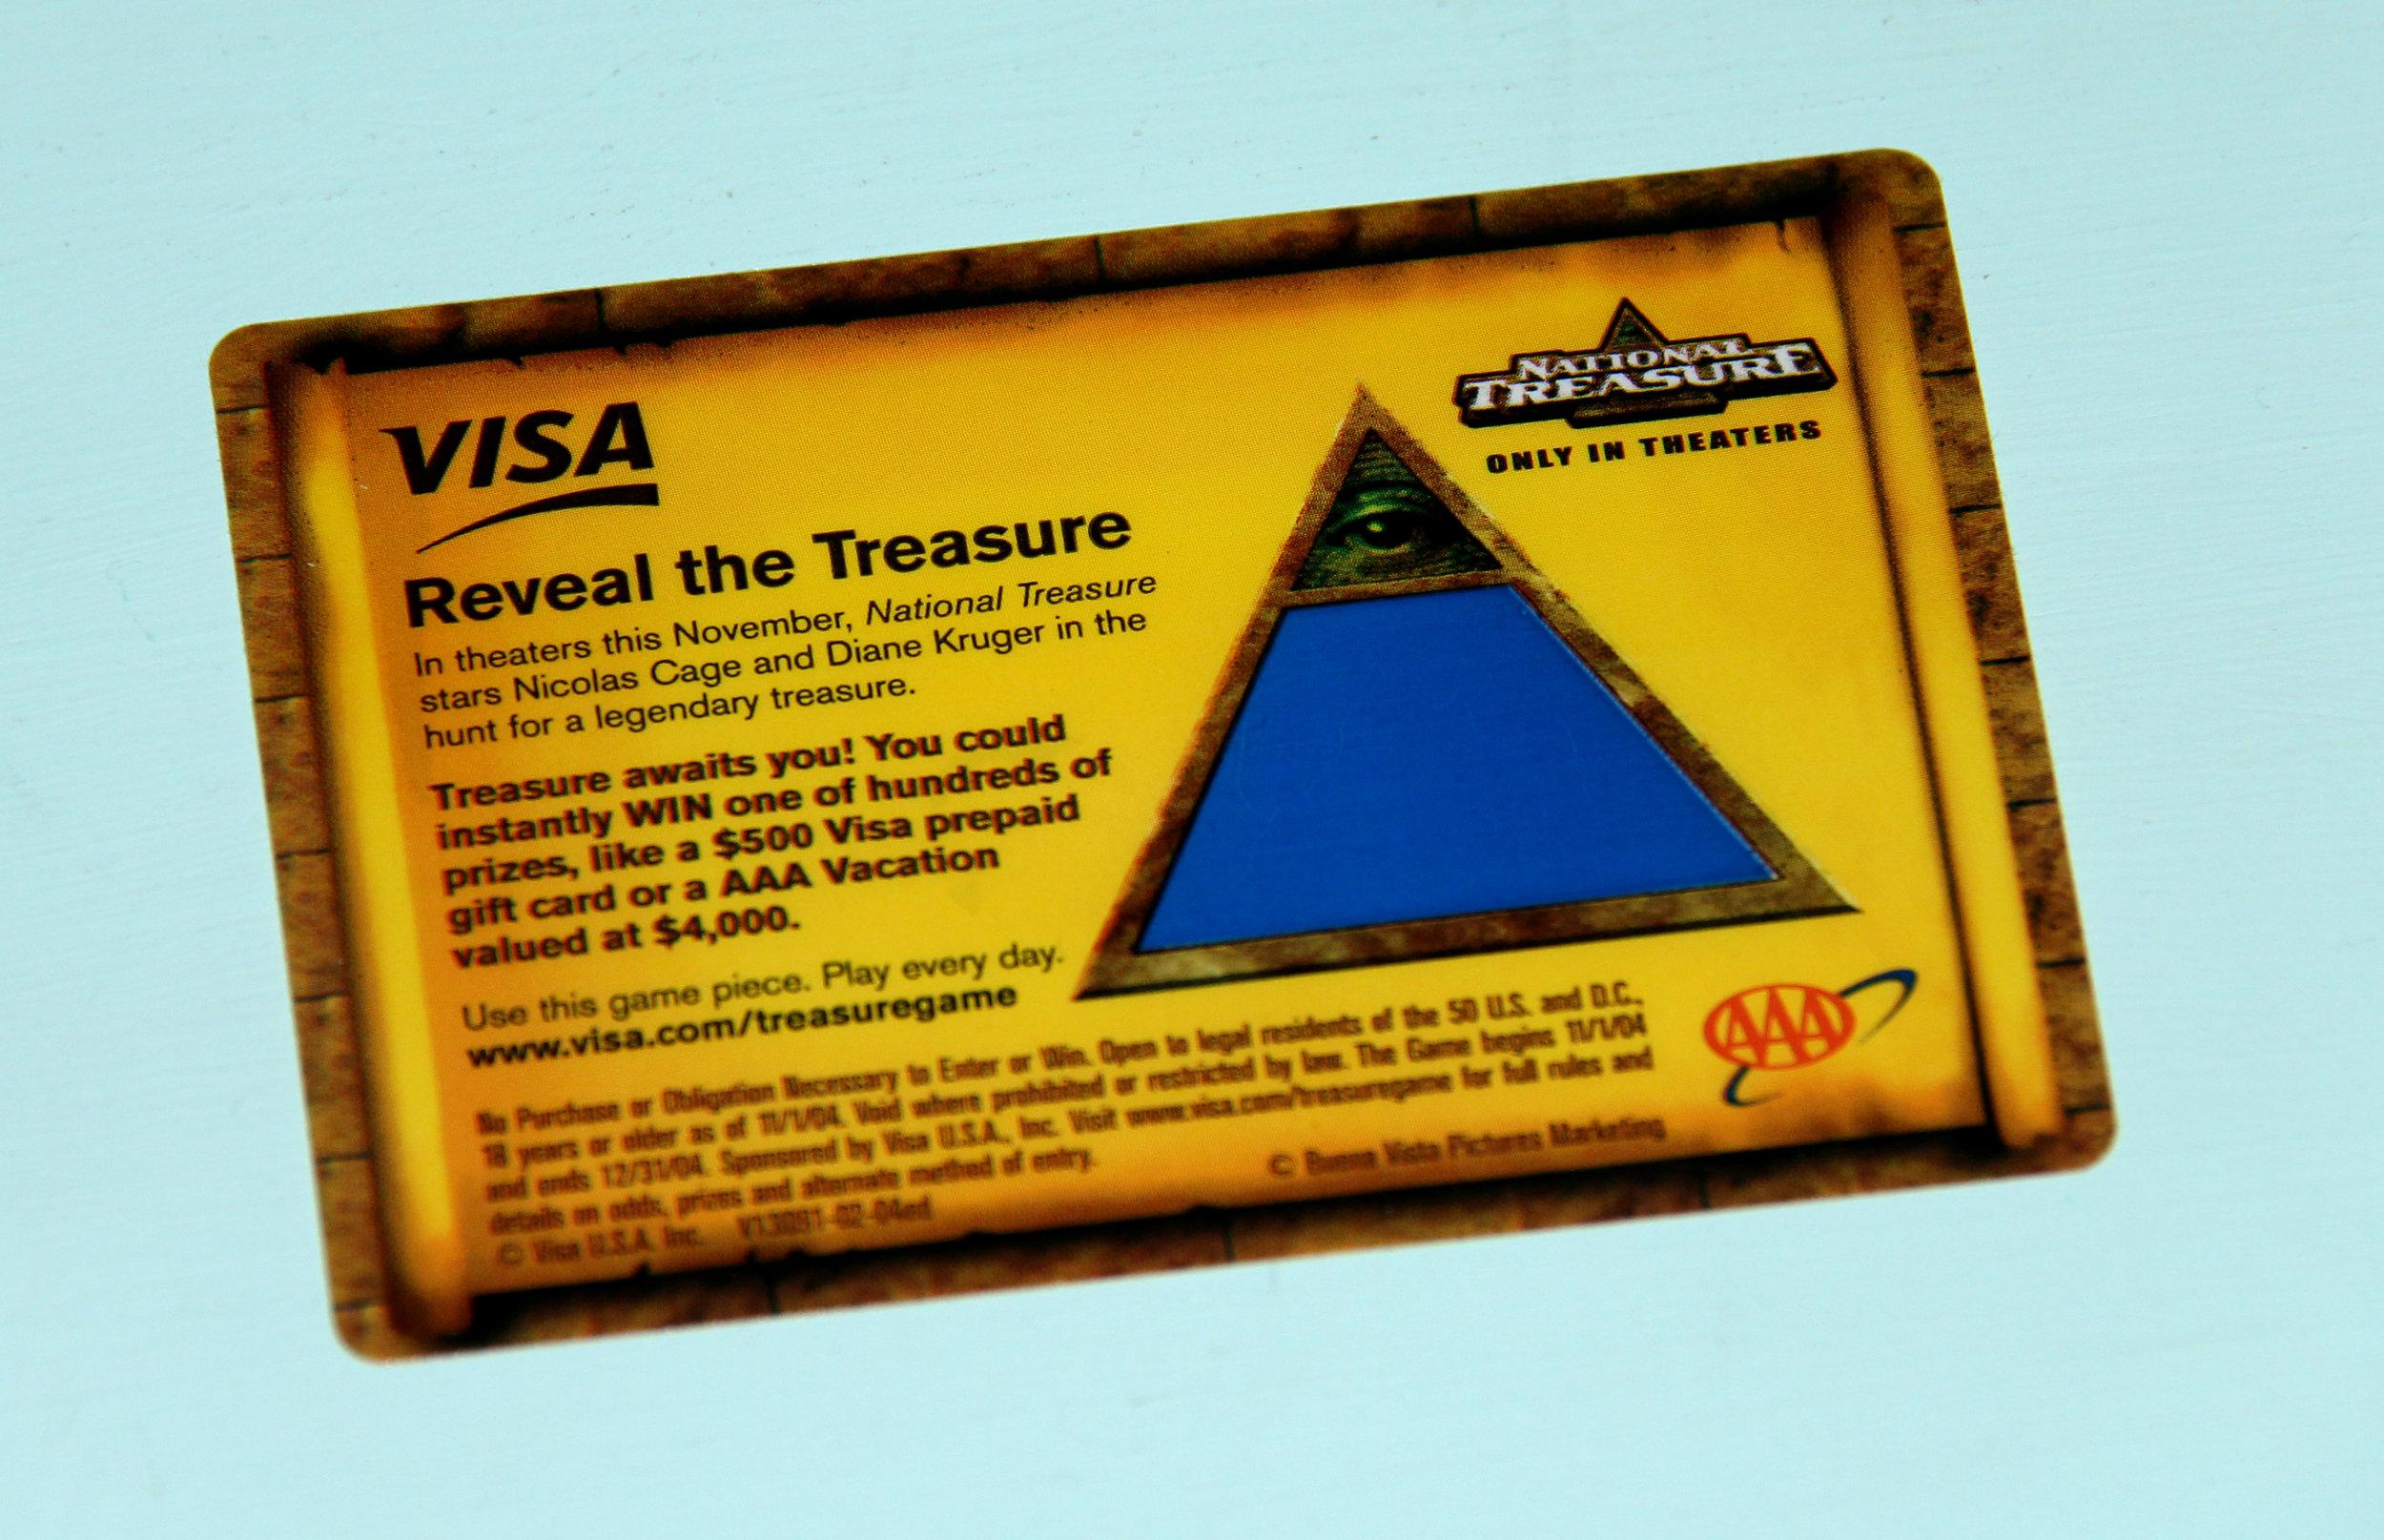 Visa Holiday Consumer Promotion Game eDecoder.